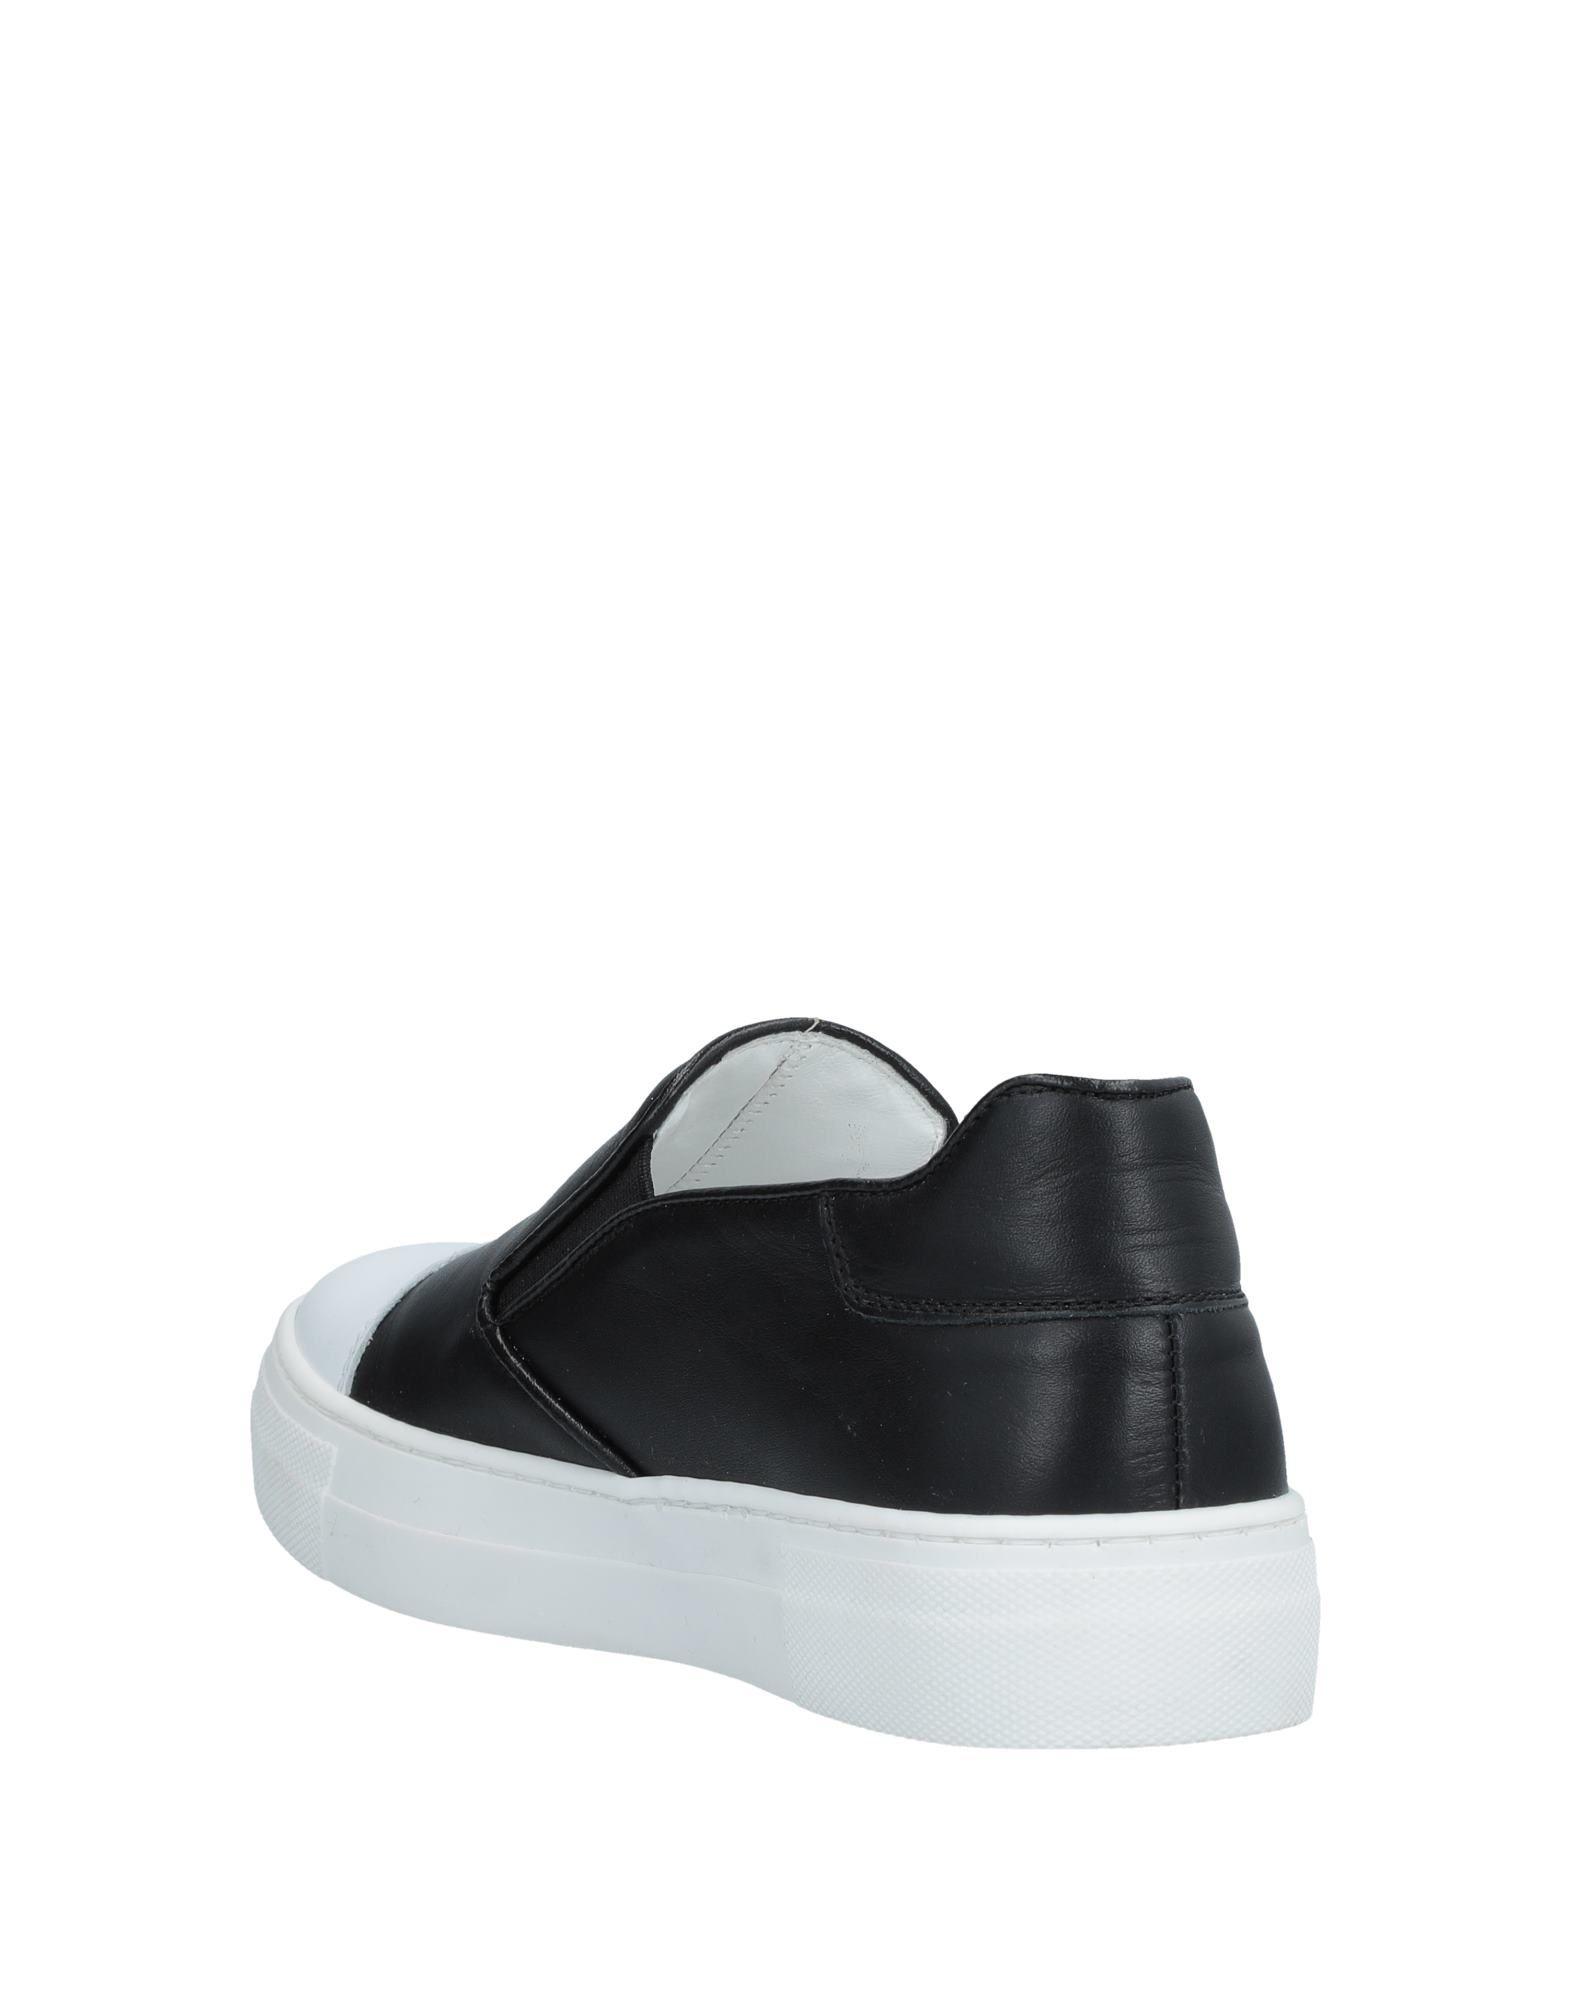 Fiamme 11525988KI Sneakers Damen  11525988KI Fiamme Gute Qualität beliebte Schuhe cb3fca